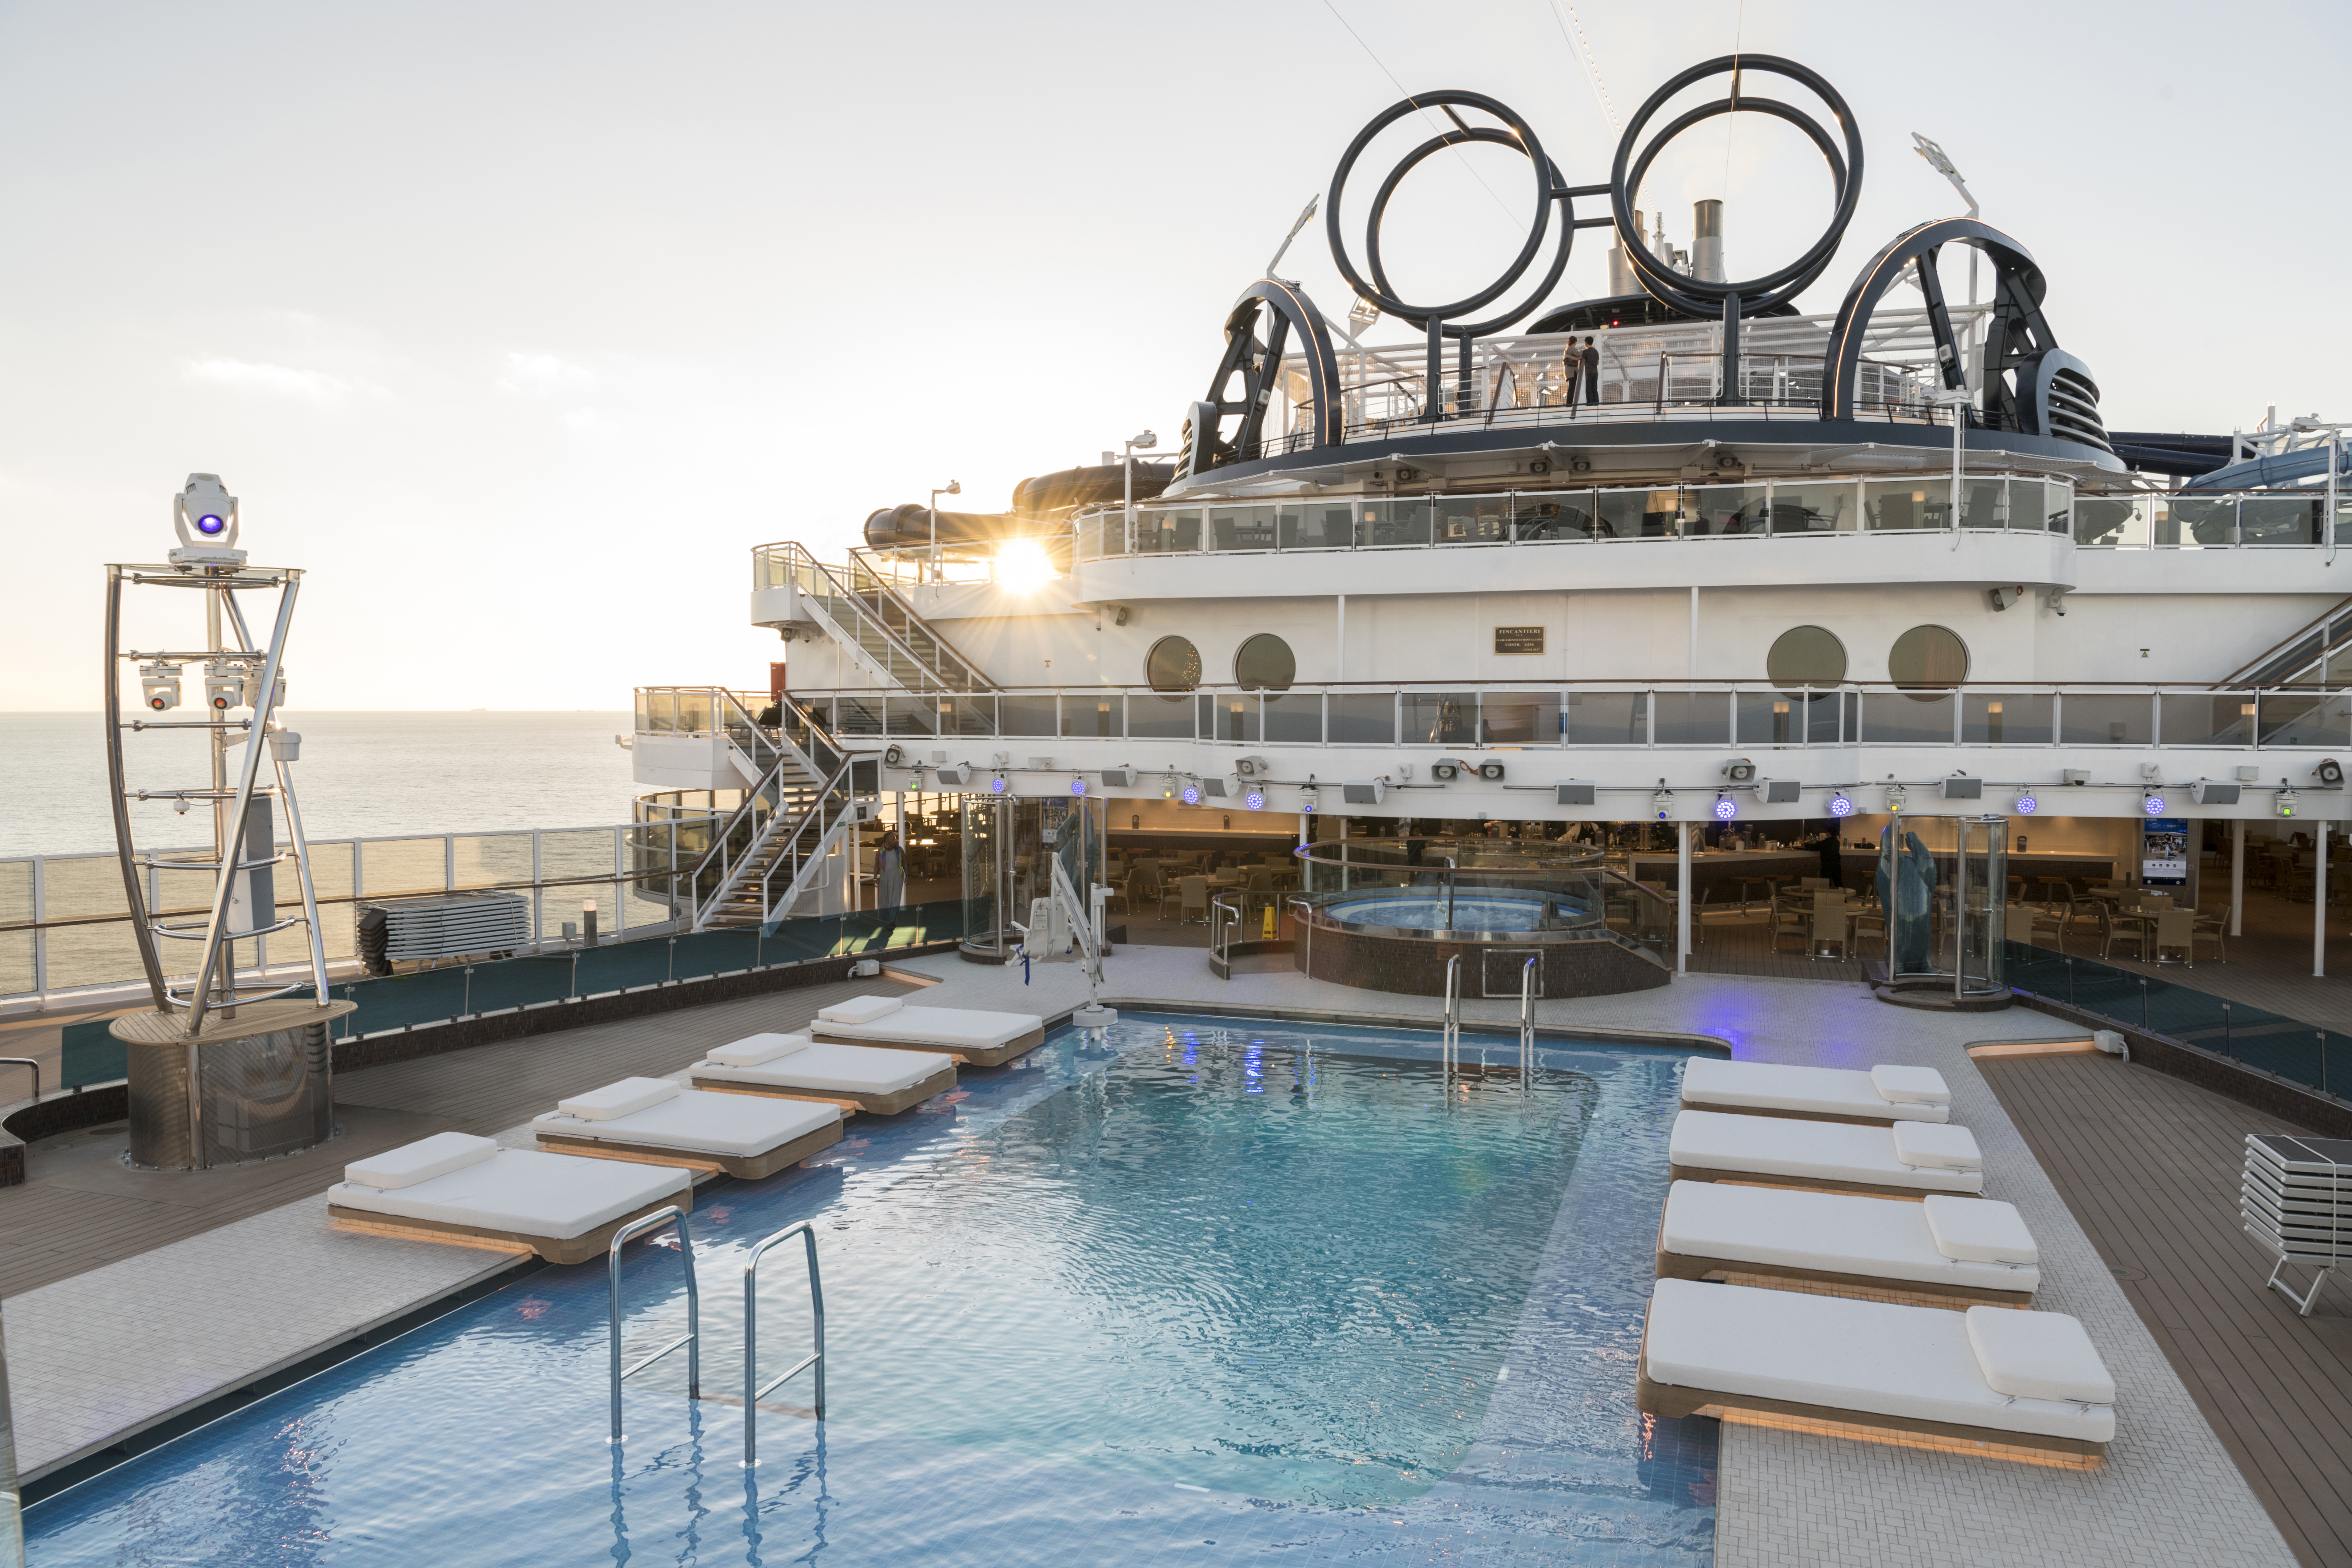 Cruise ship show reality 'Below Deck'